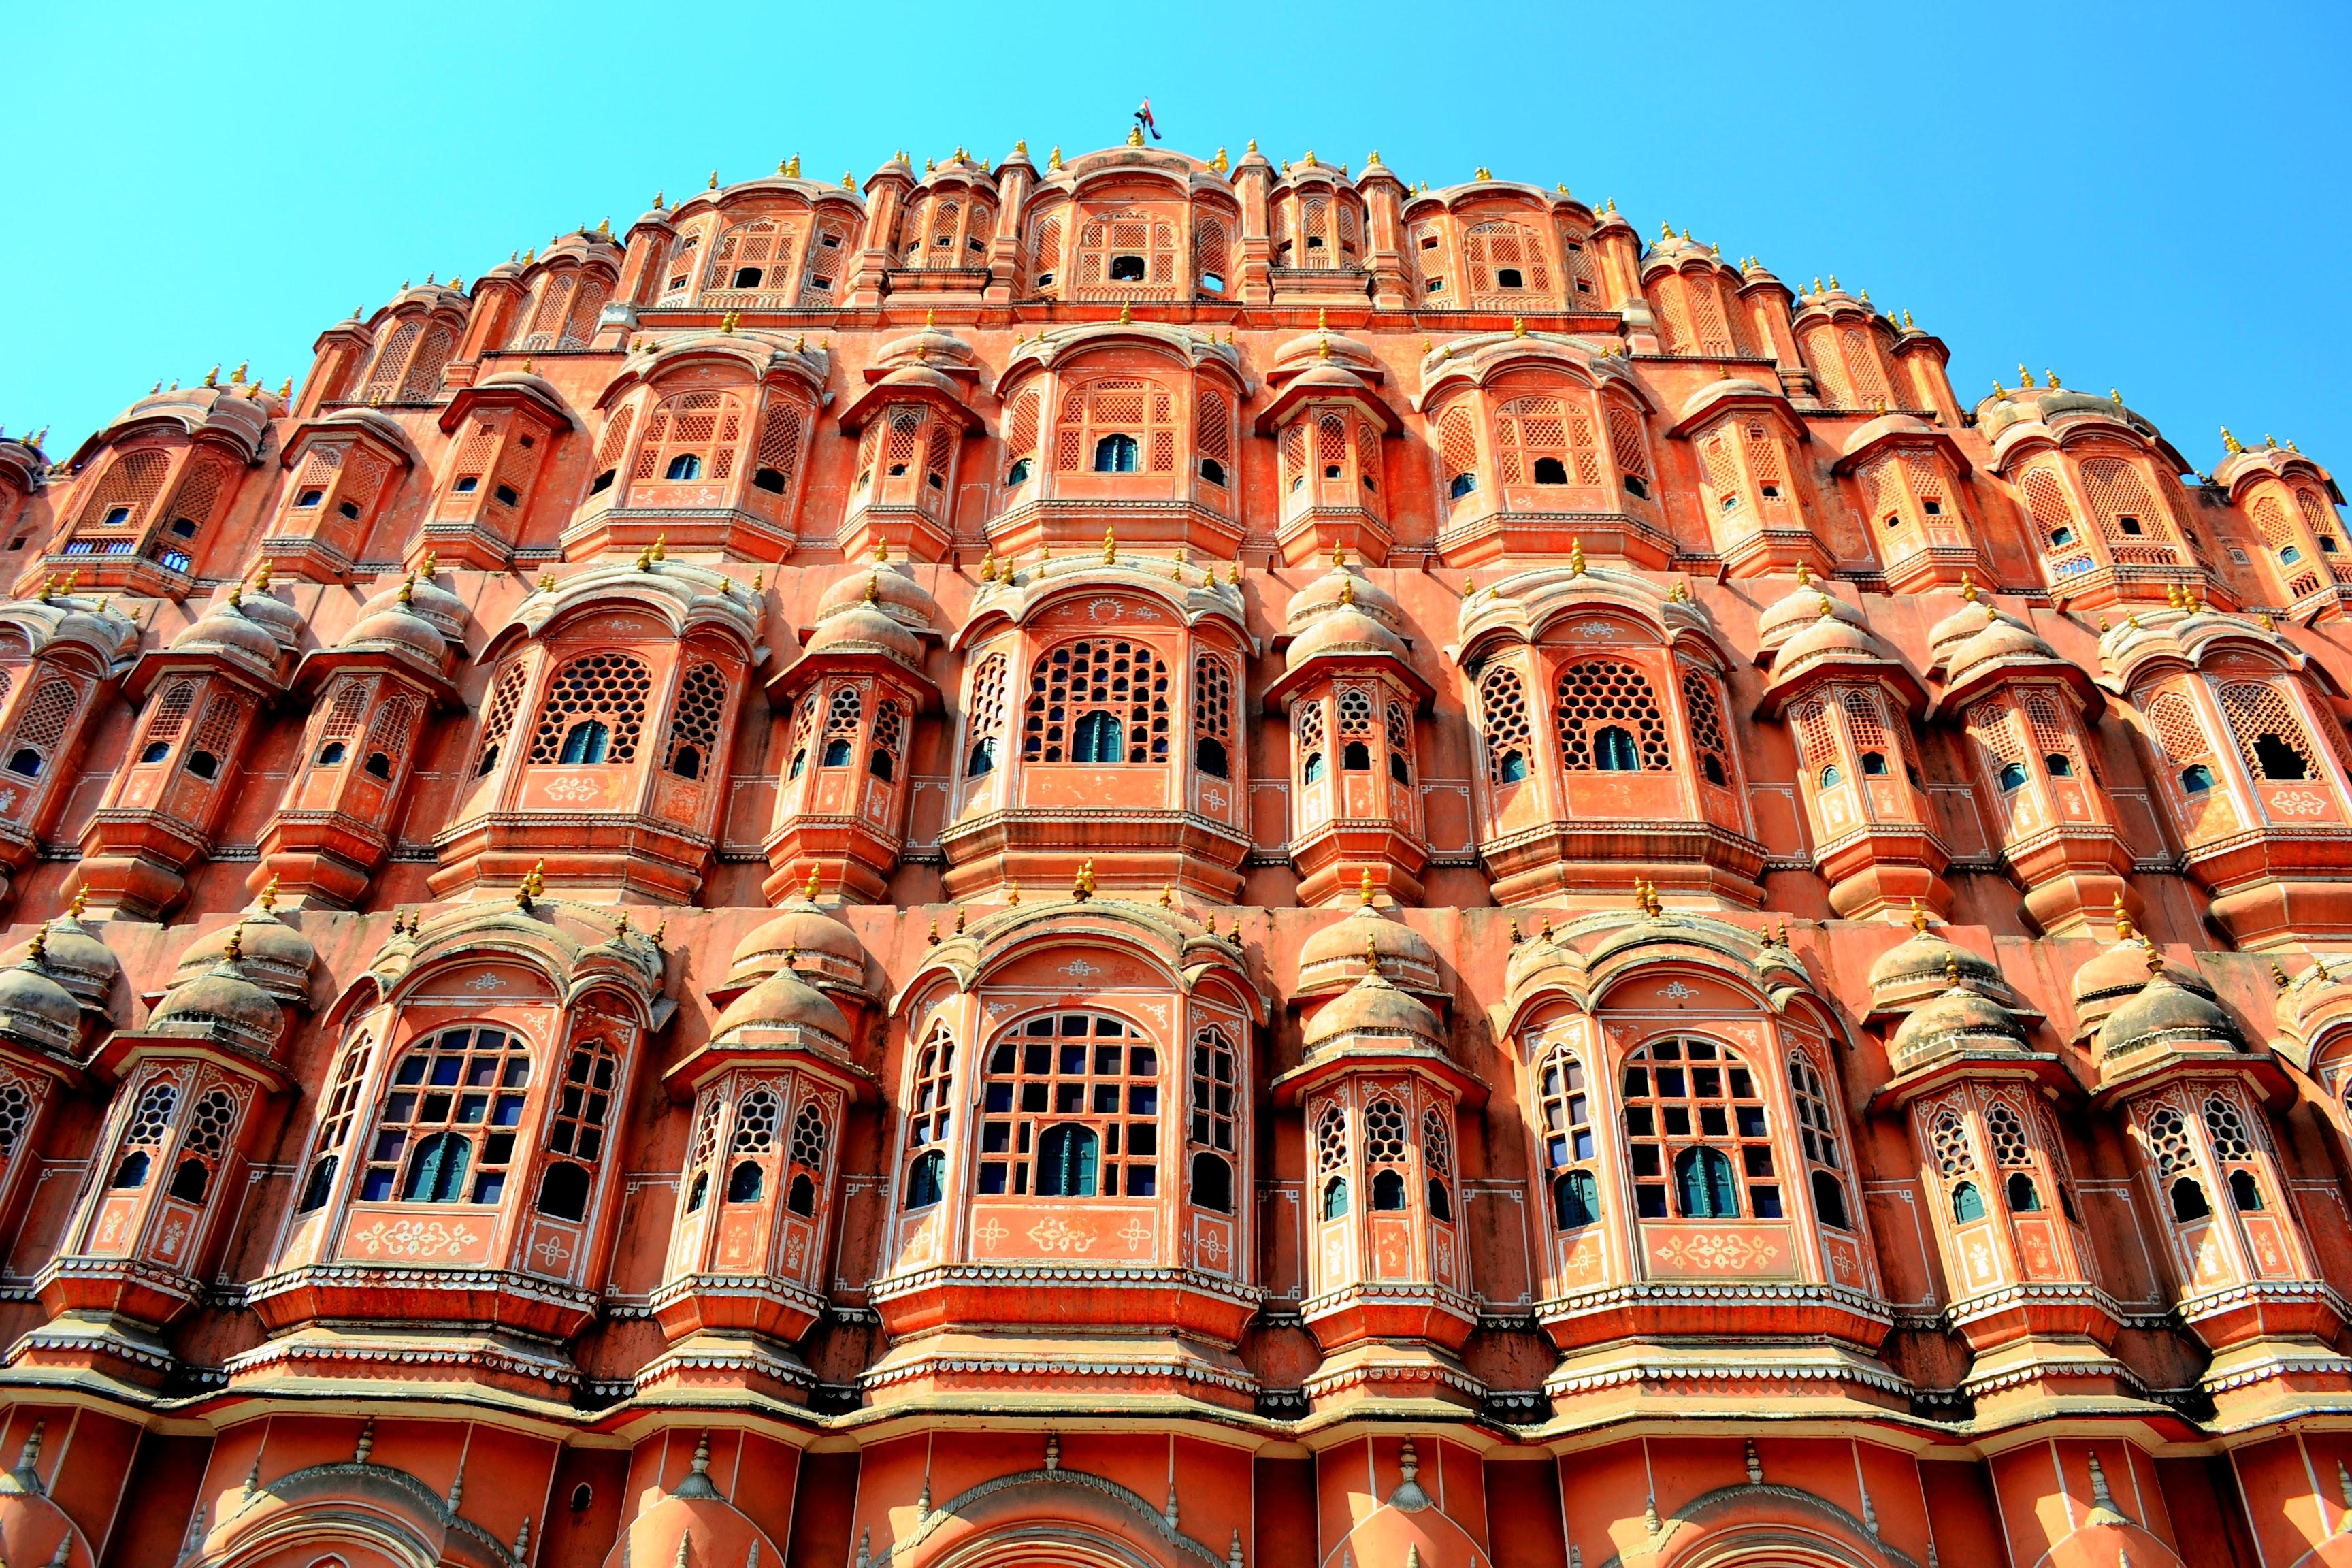 India Travel Destination: Hawa Mahal (Palace of Winds) in Jaipur